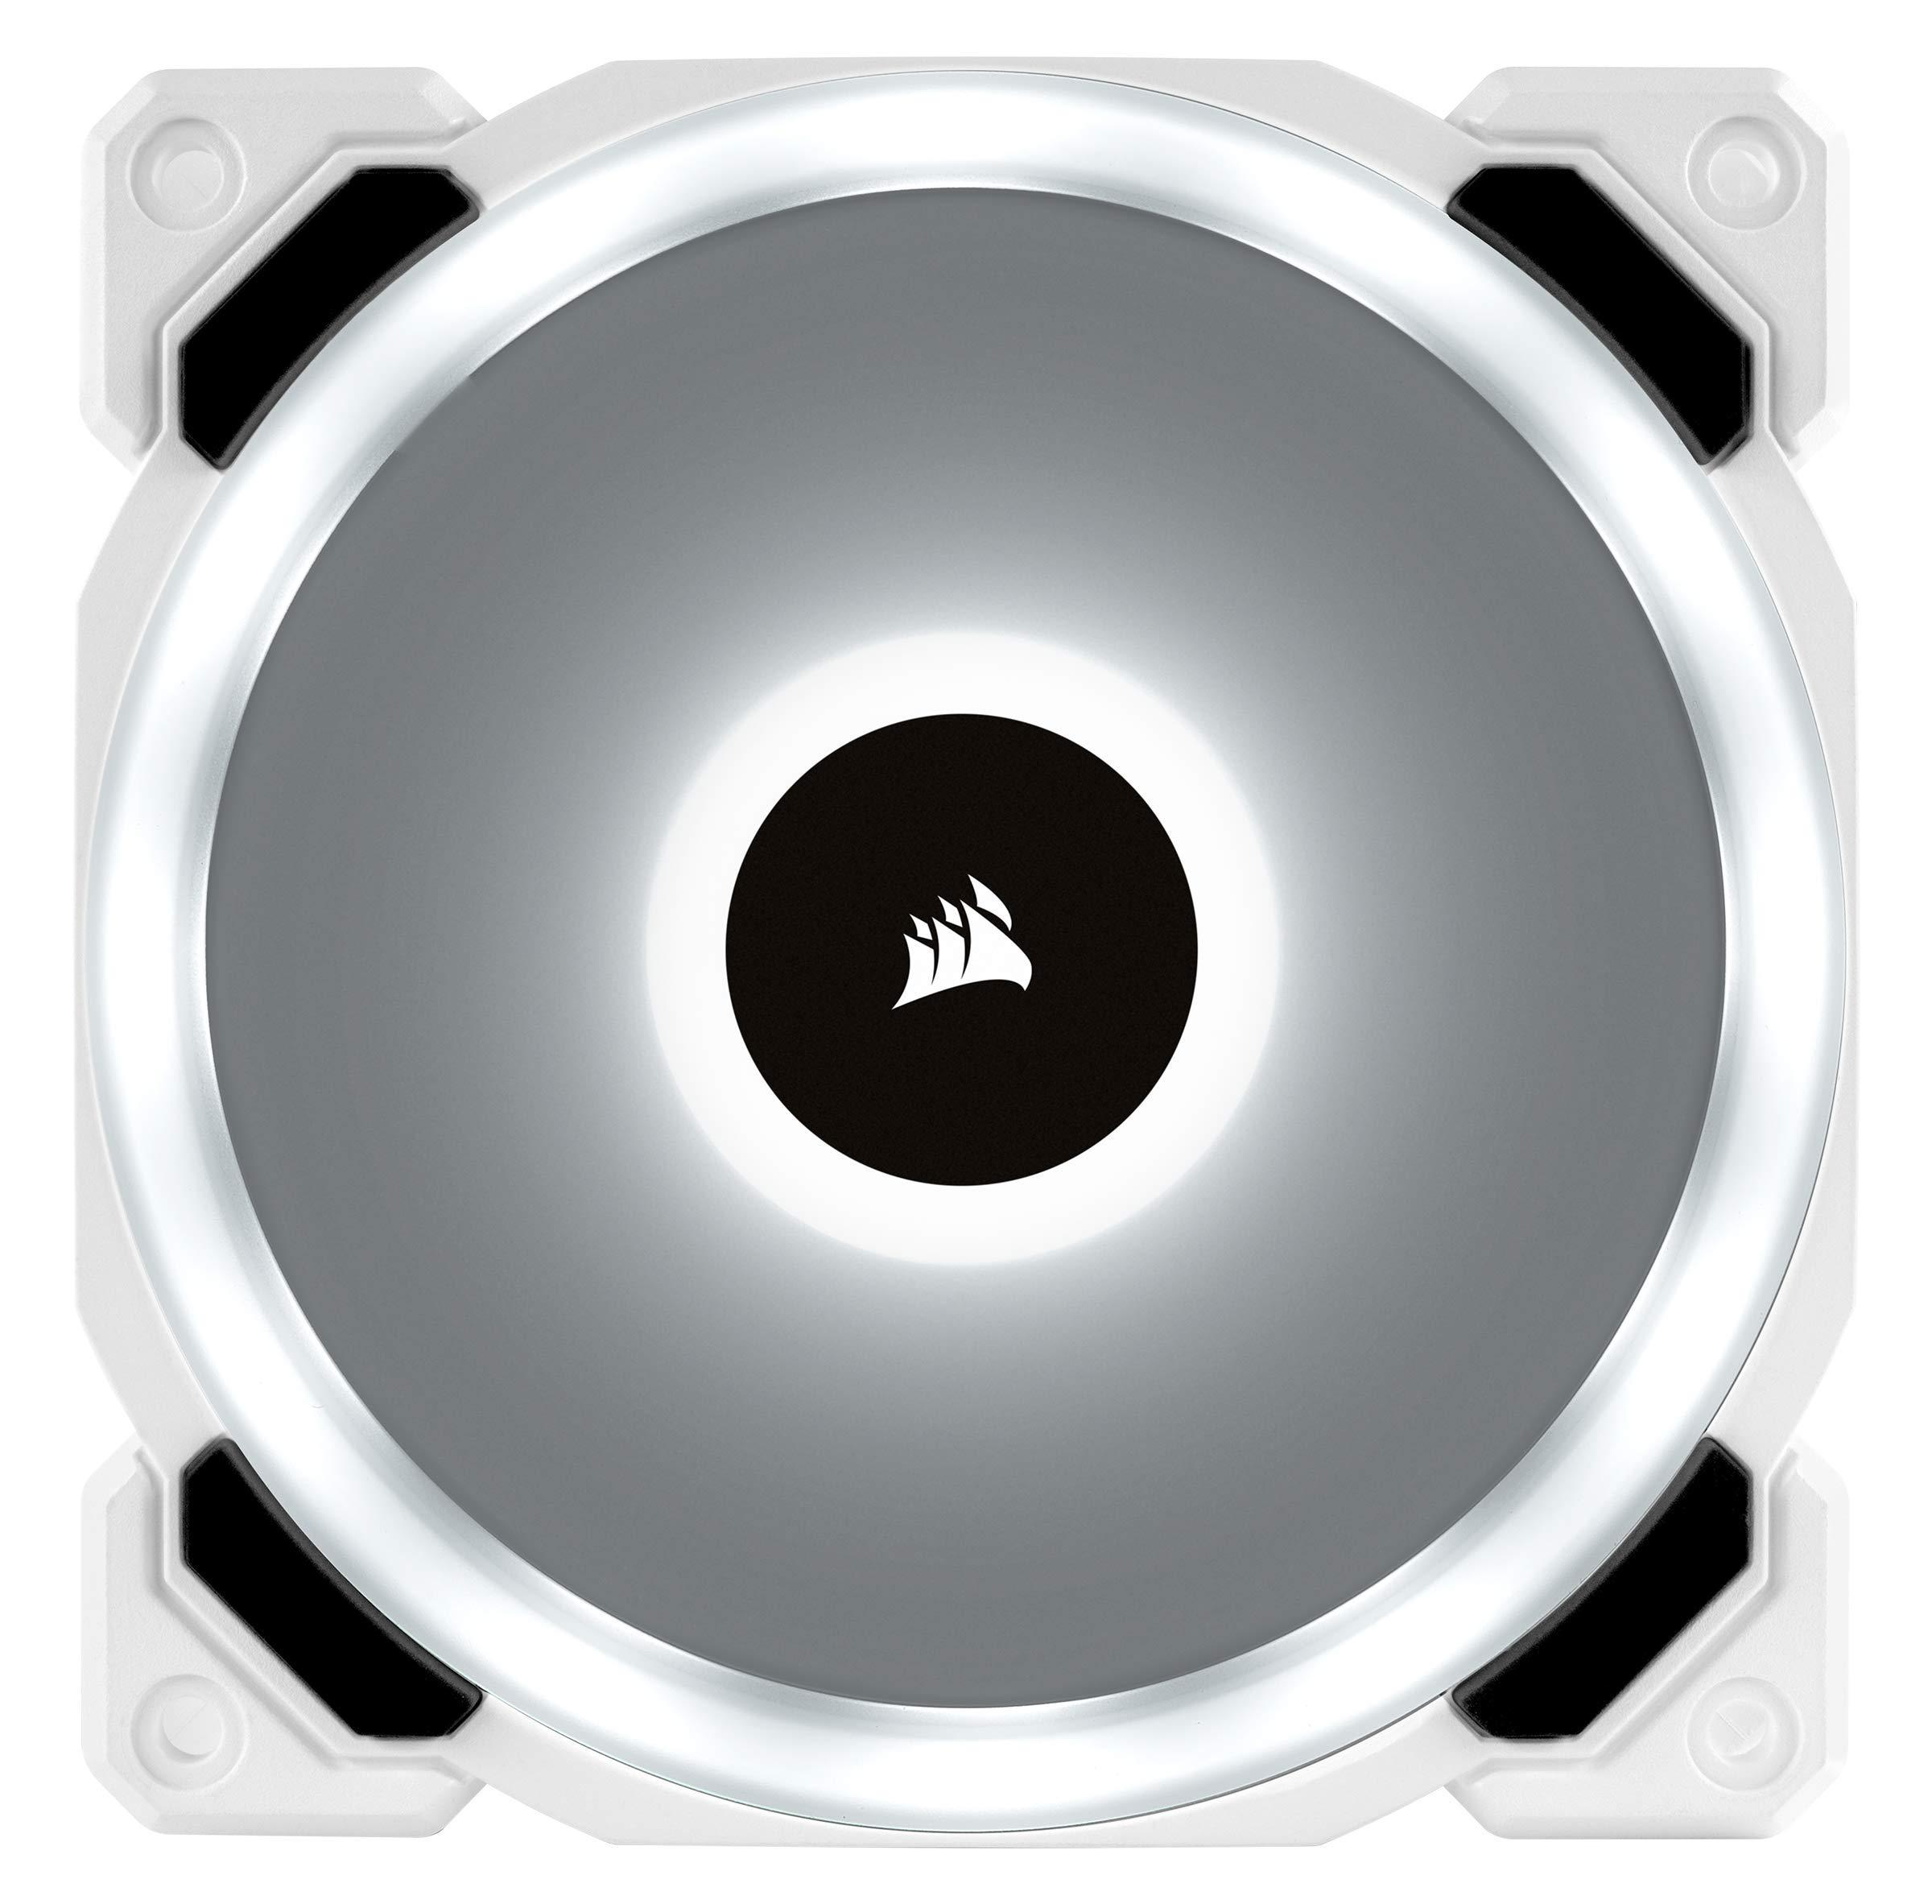 CORSAIR LL Series, LL120 RGB, 120mm RGB LED Fan, Triple Pack with Lighting Node PRO- White by Corsair (Image #14)